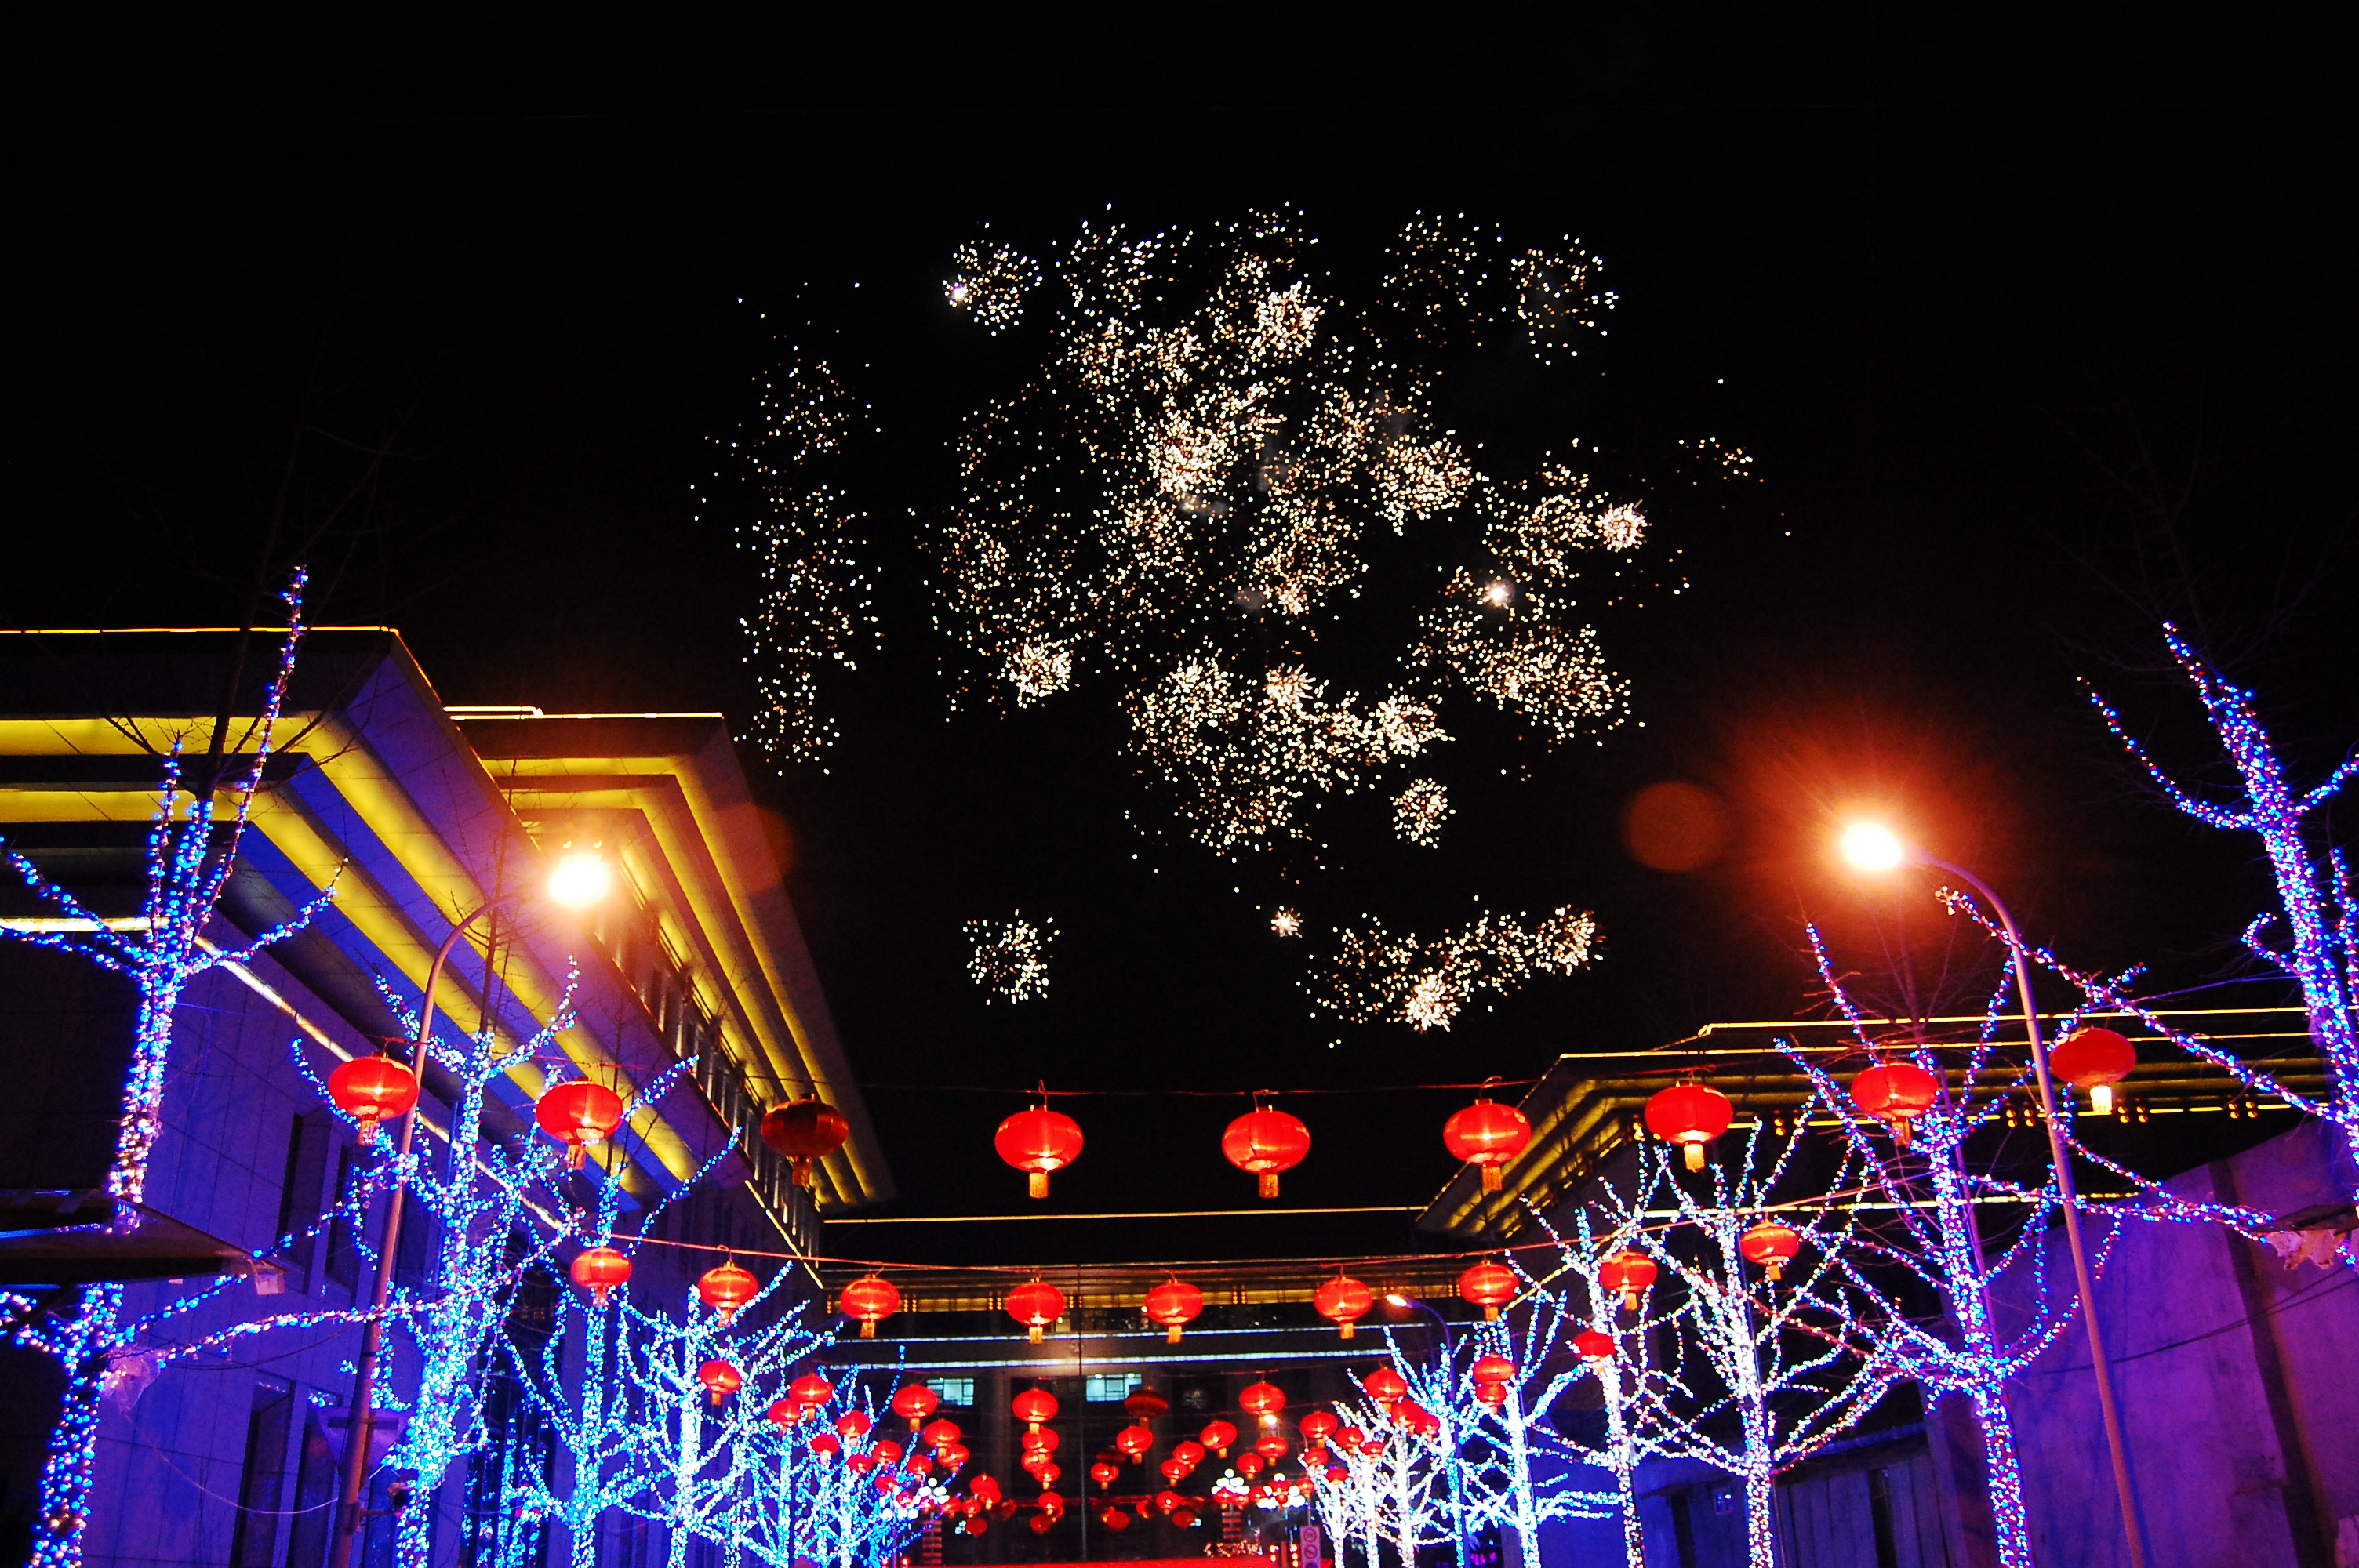 Hasil gambar untuk chinese new year in beijing